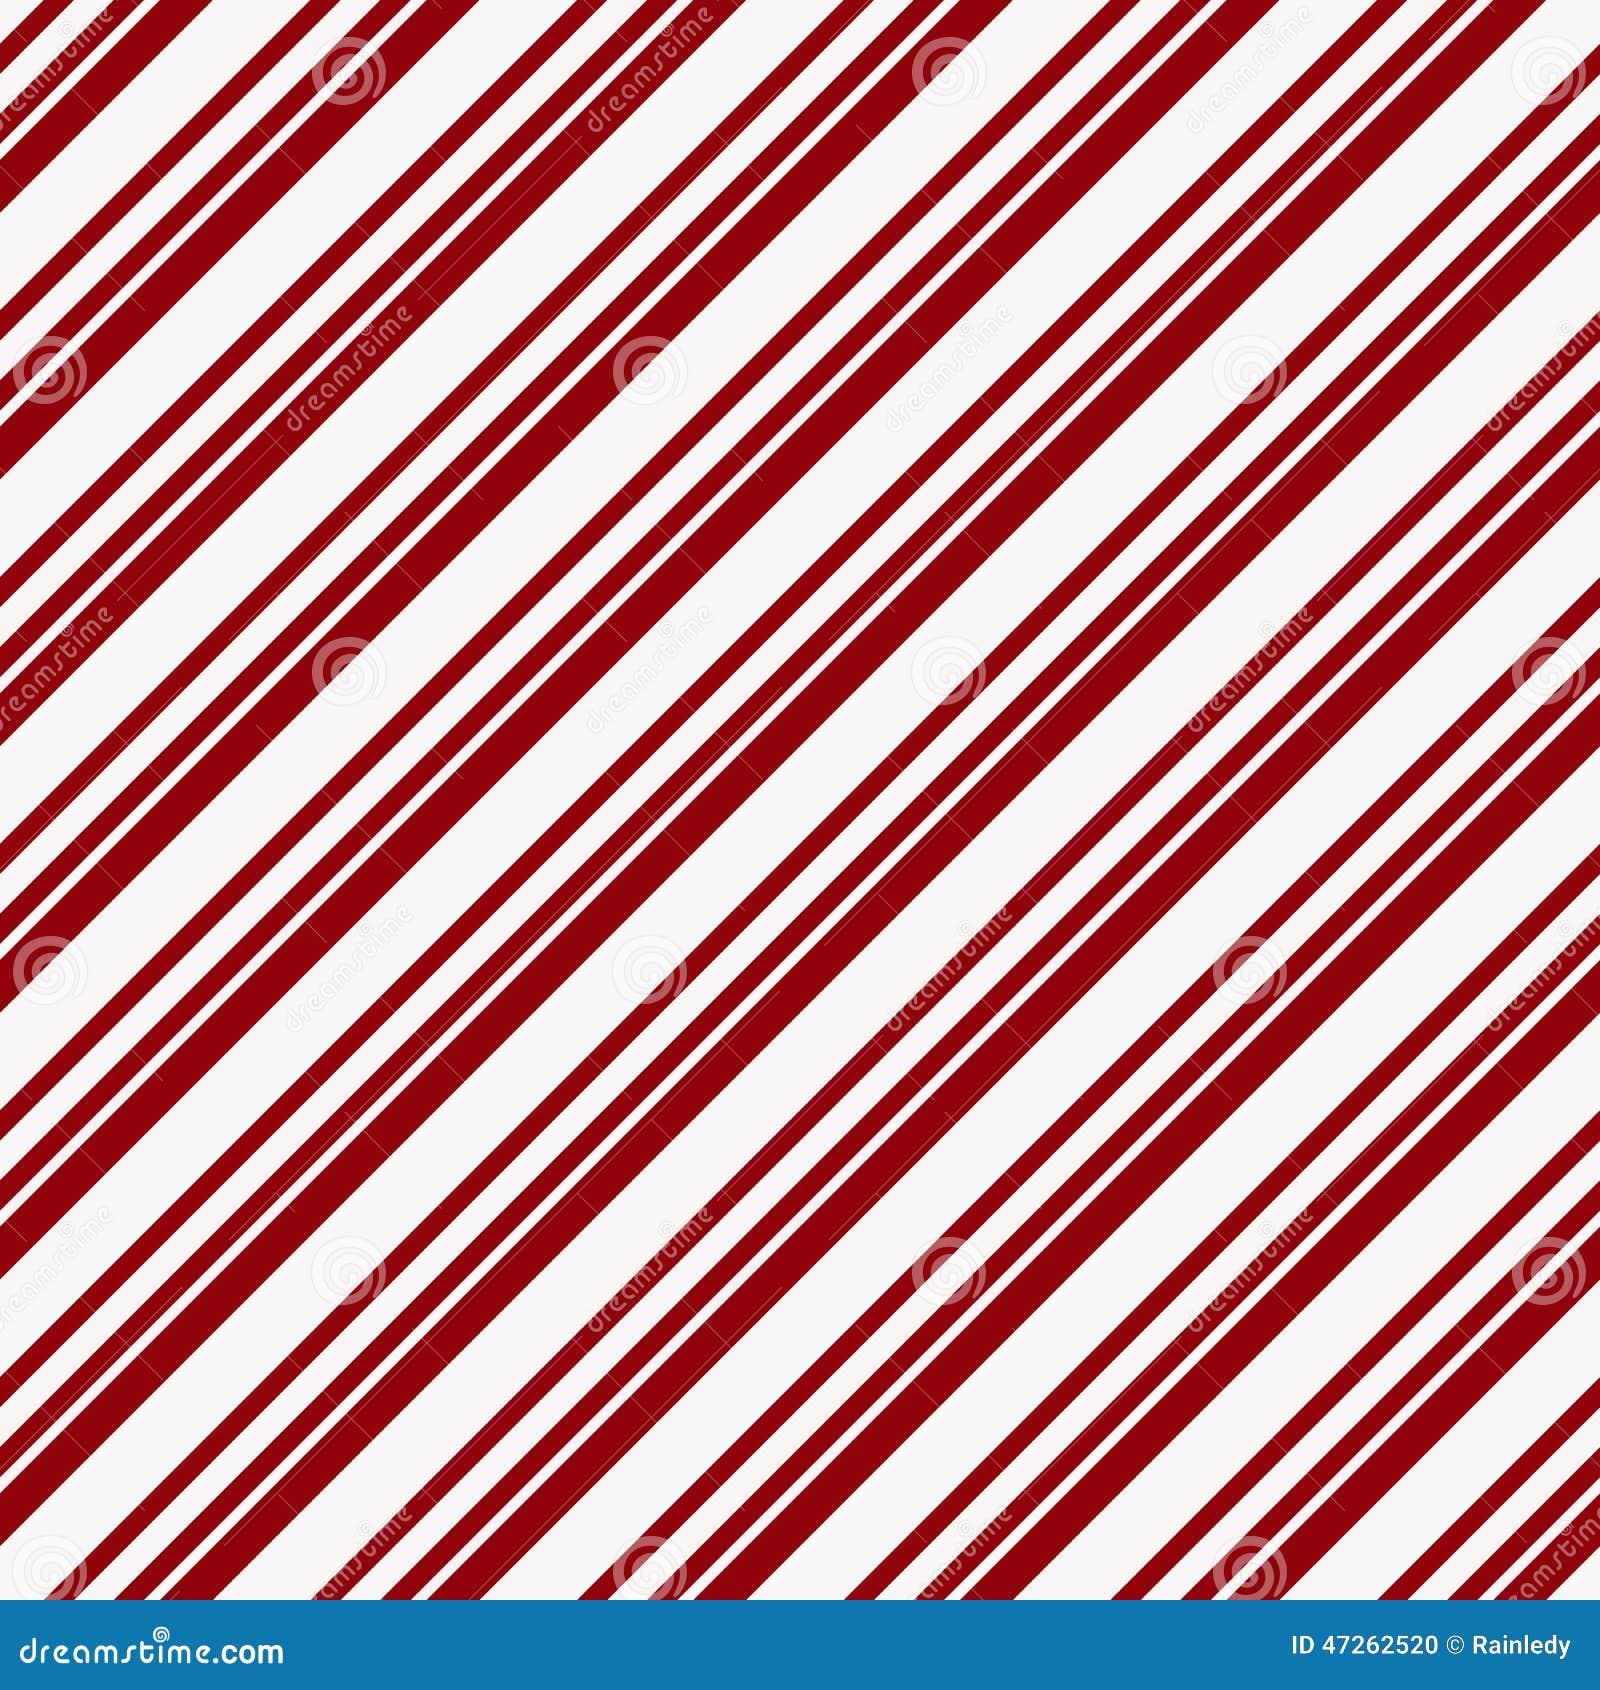 And black diagonal stripes background seamless background or wallpaper - Background Christmas Diagonal Paper Pattern Red Seamless Stripes